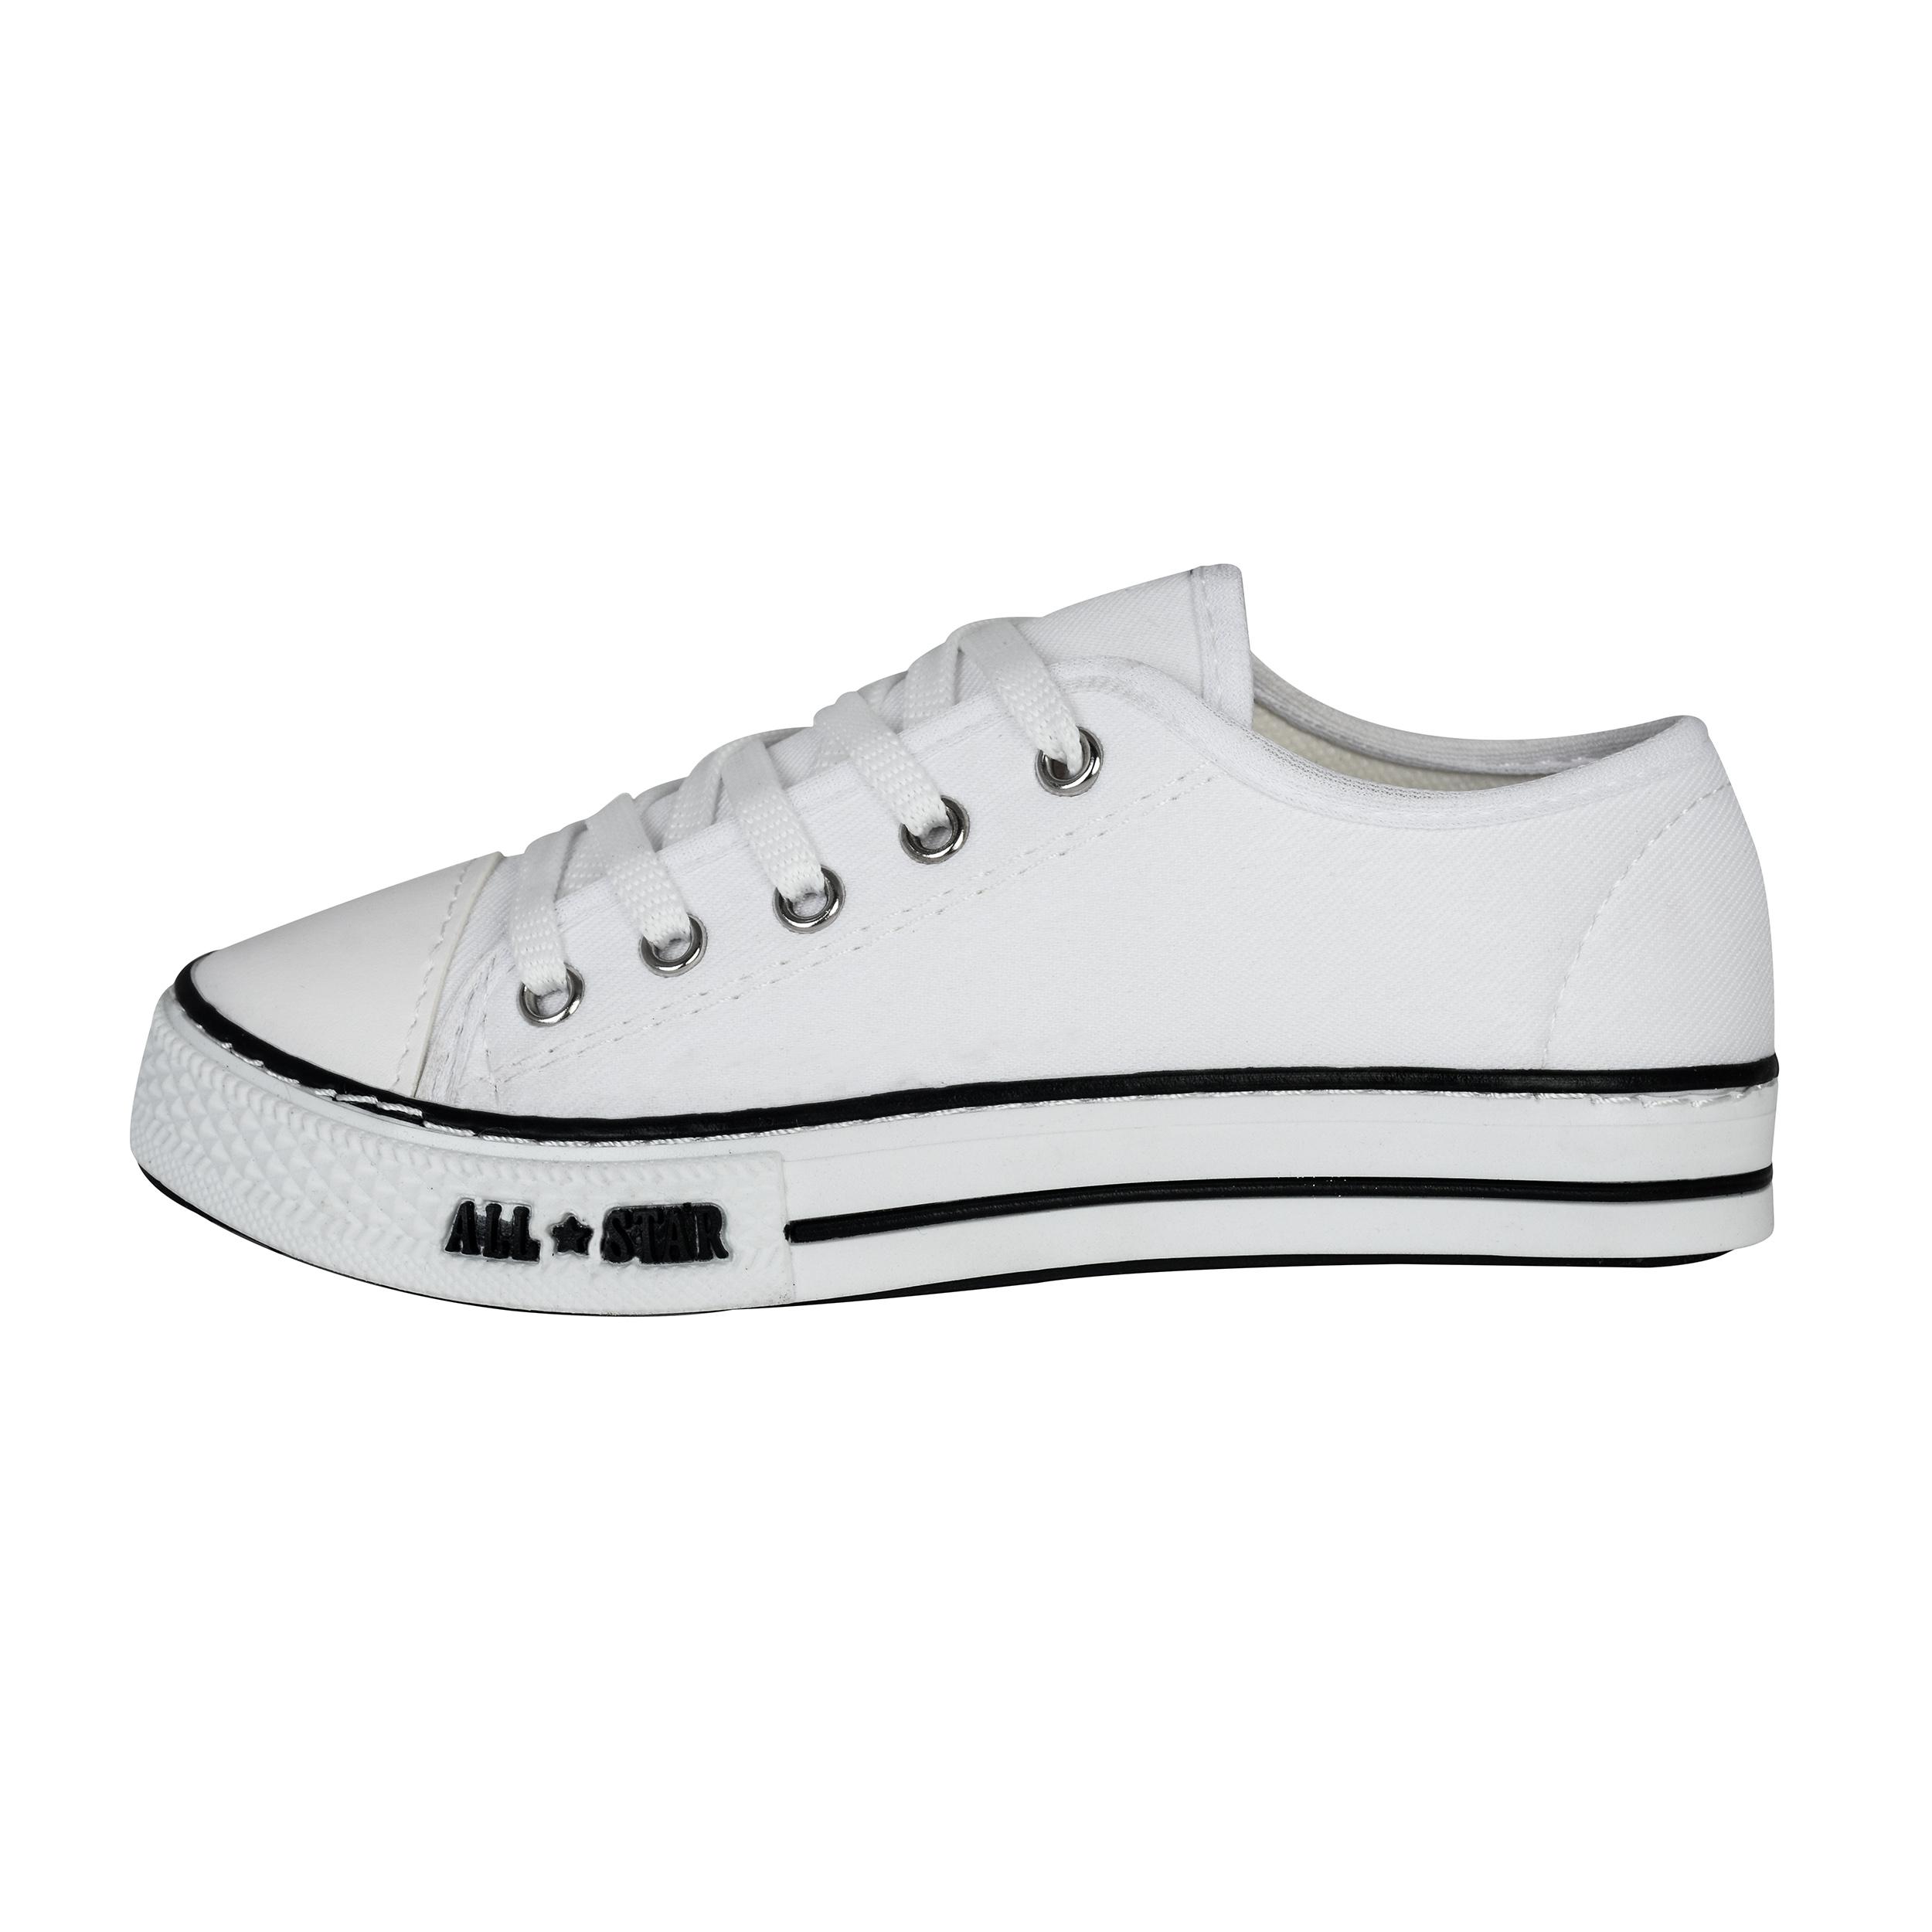 کفش راحتی دخترانه کد A_S                     غیر اصل